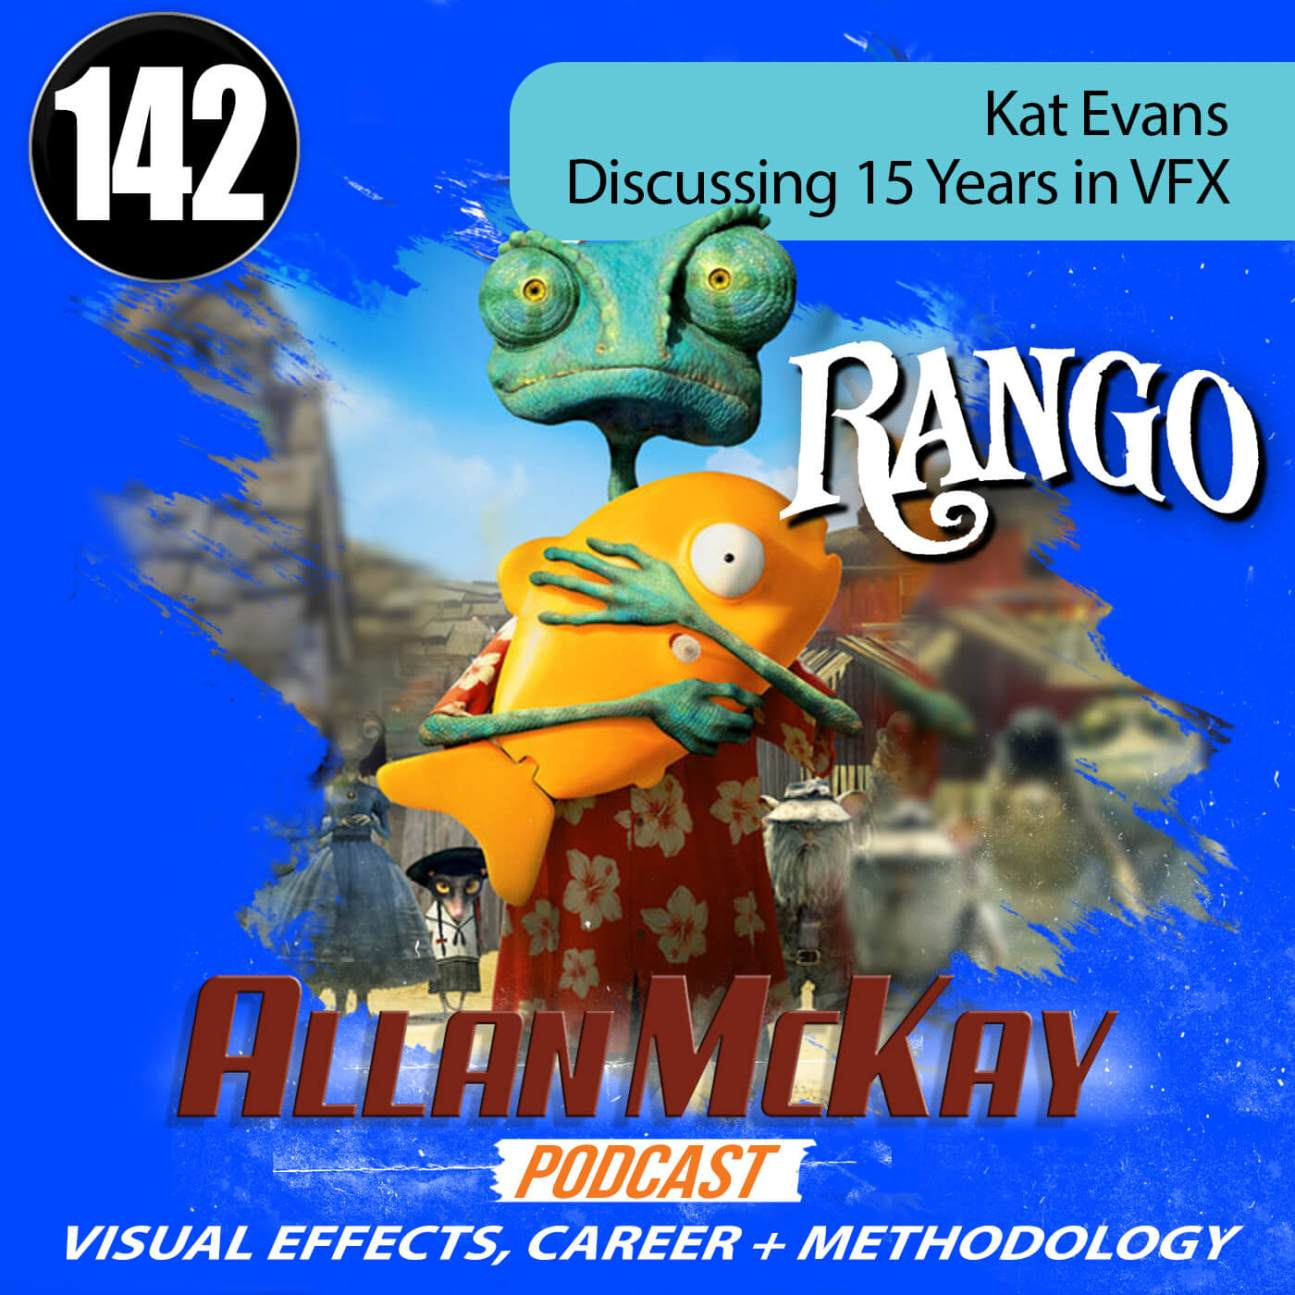 Episode 142 - Kat Evans - Discussing 15 Years in VFX - Allan